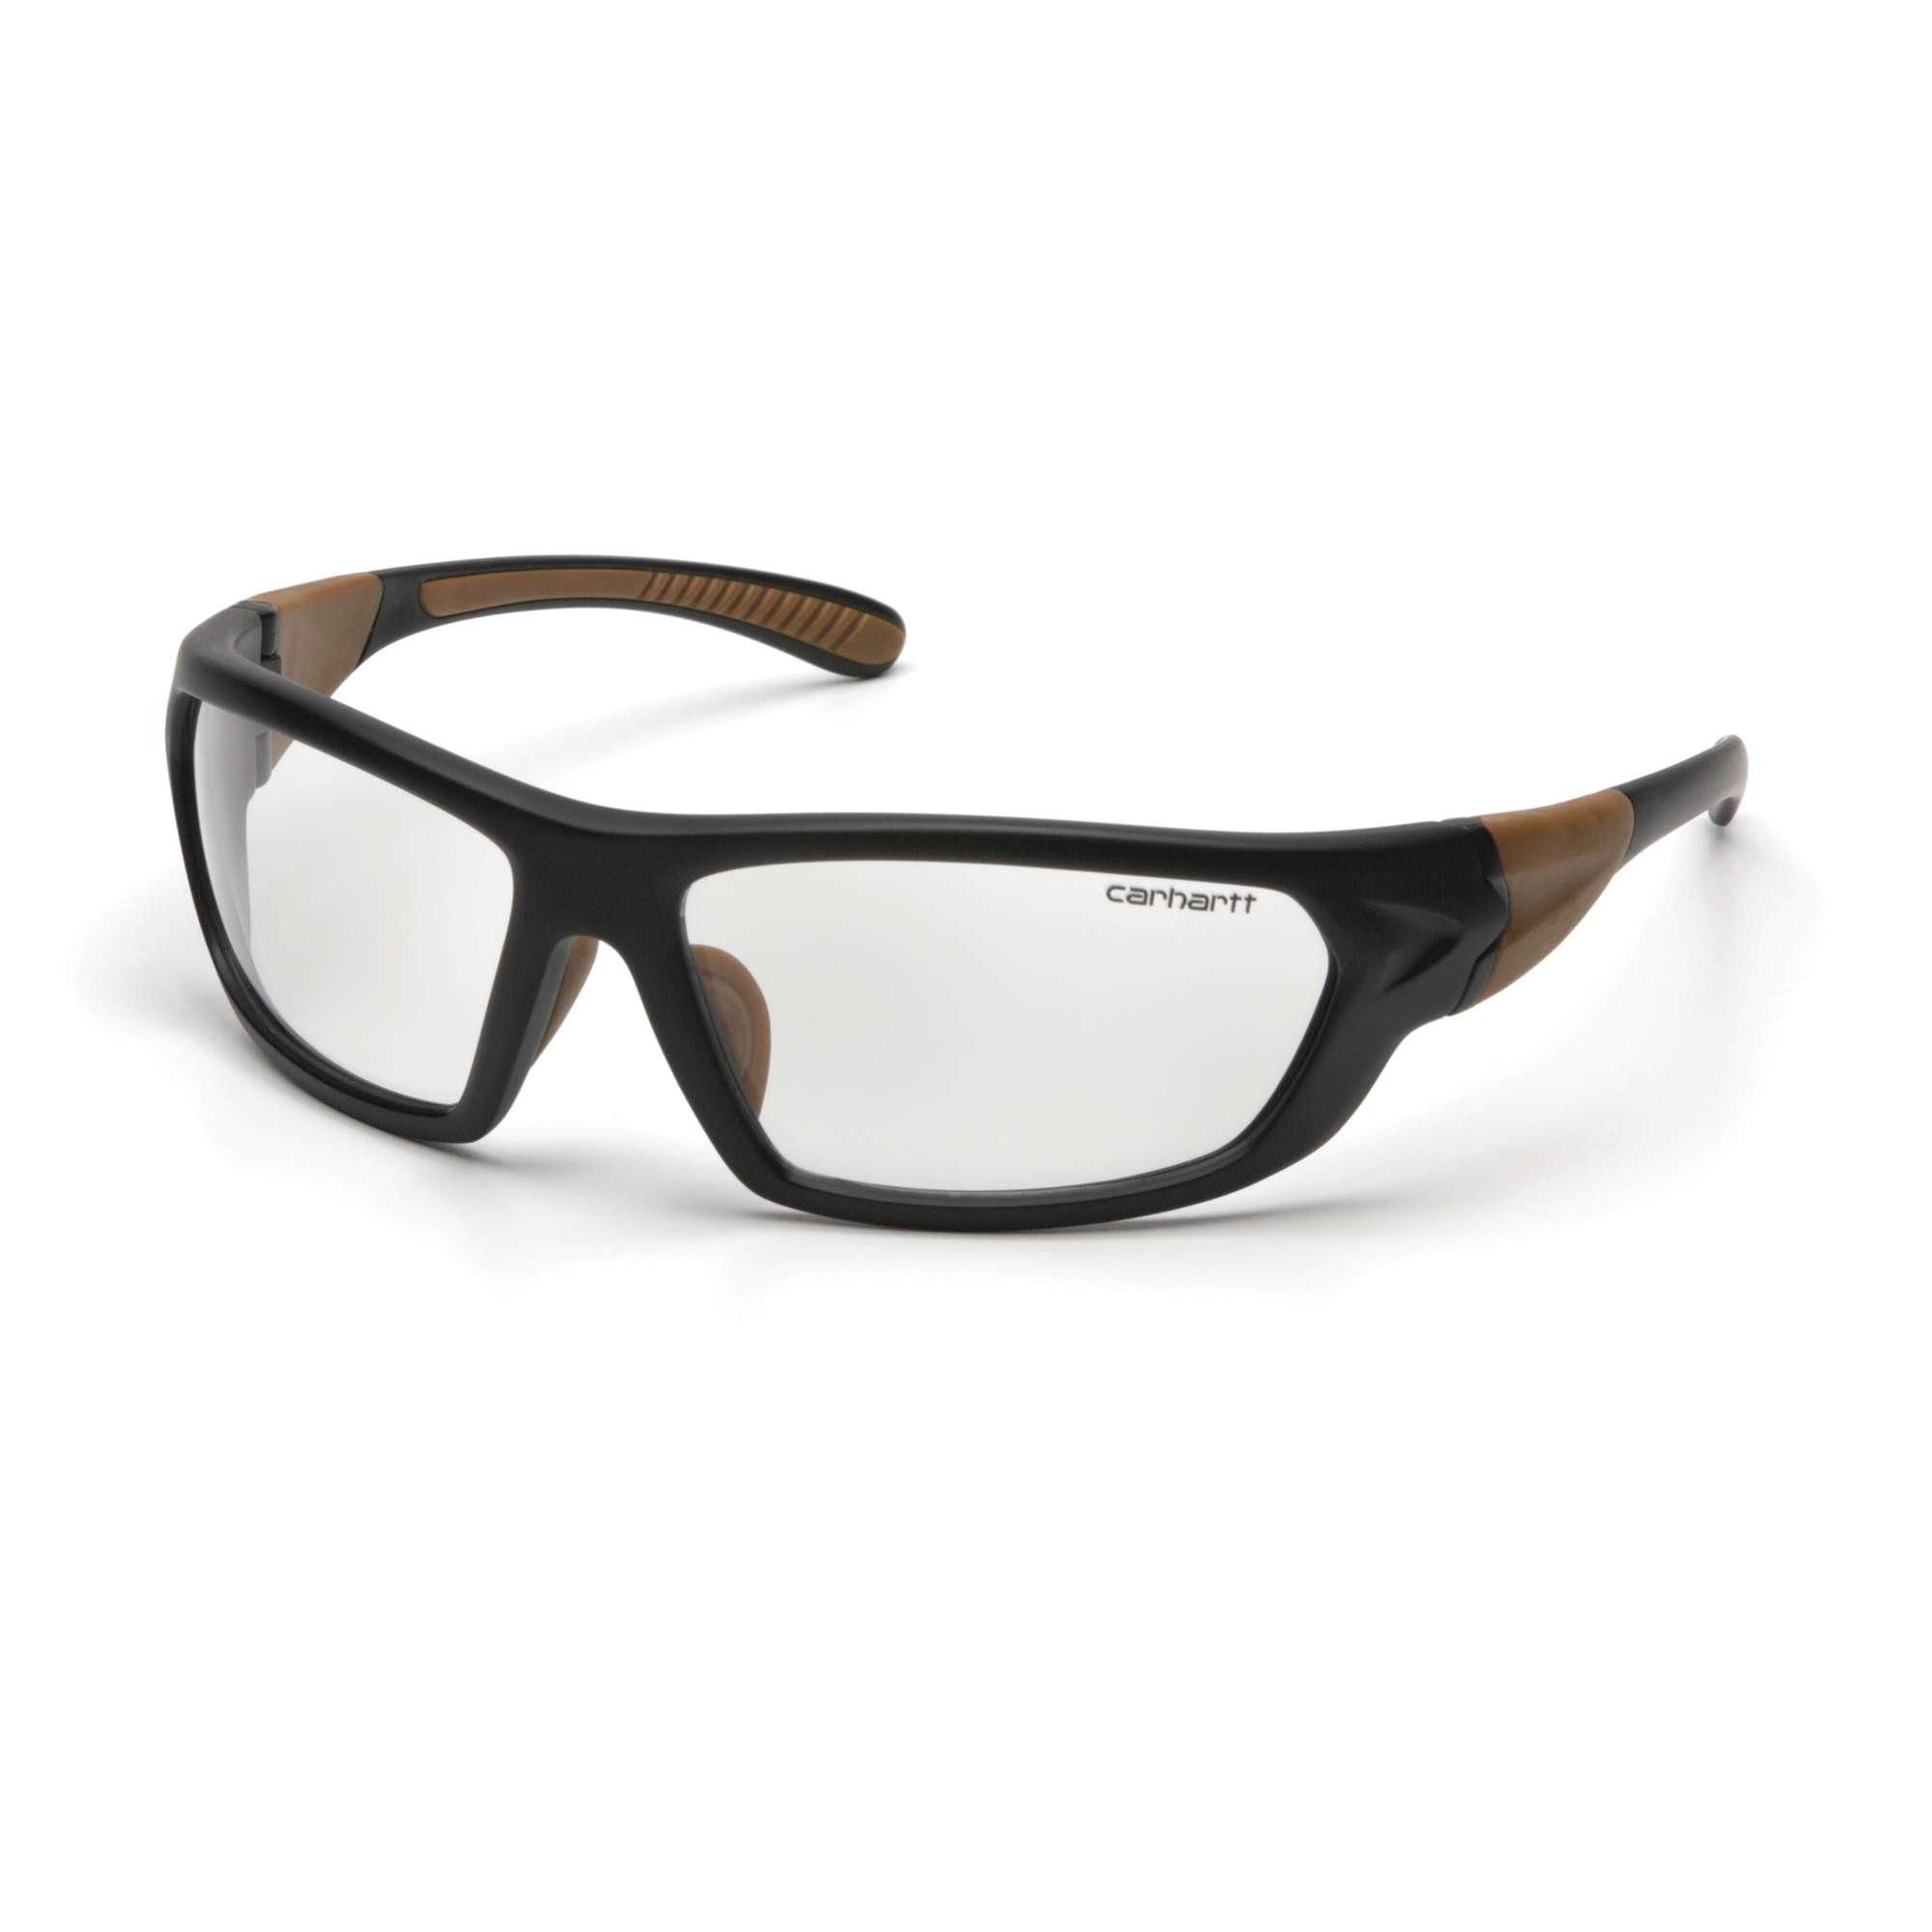 Carhartt Carbondale Anti-Fog Safety Glasses